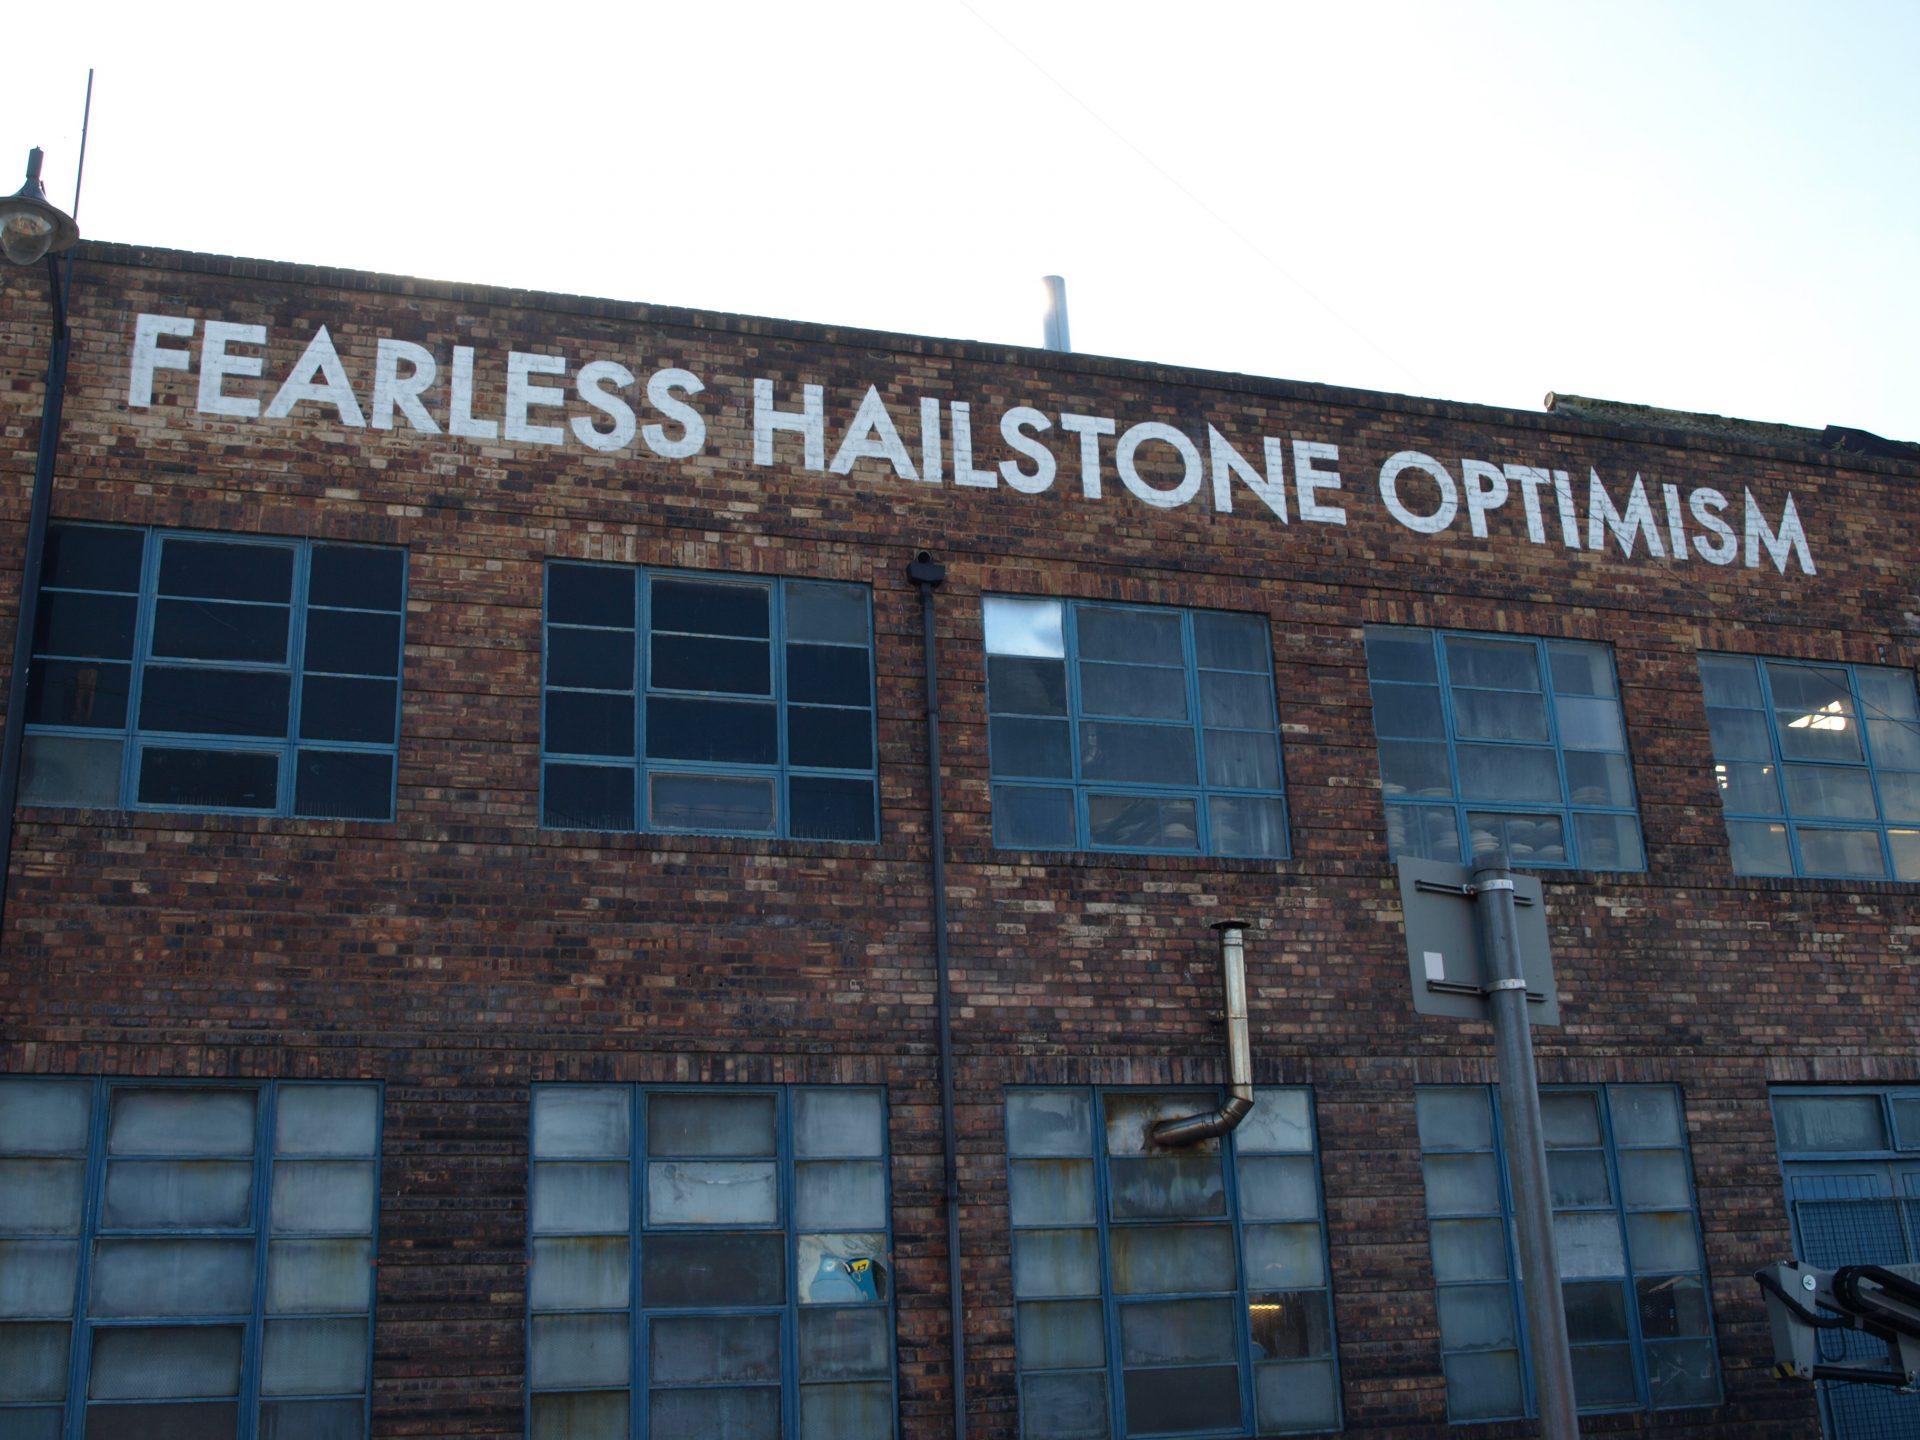 Fearless Hailstone Optimism